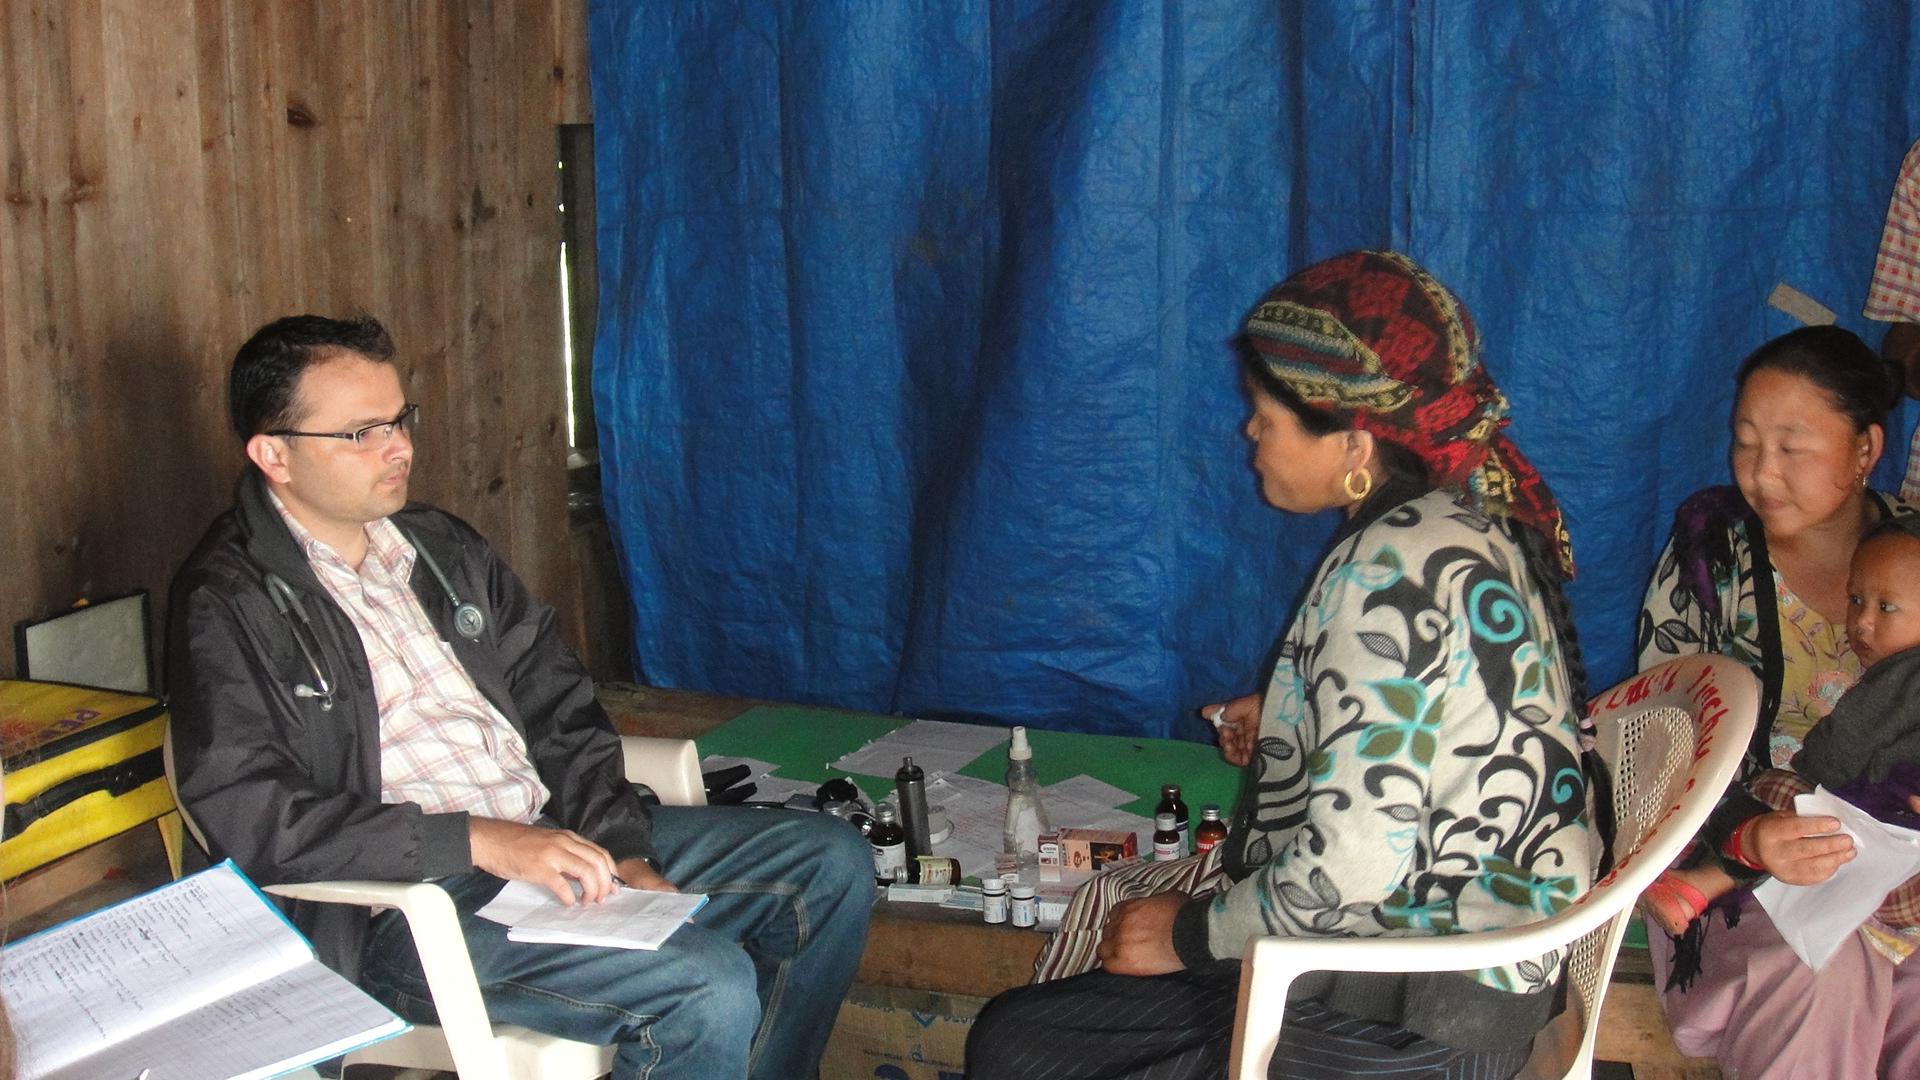 Professional_Volunteering_Adventure_Alternative_Nepal.JPG